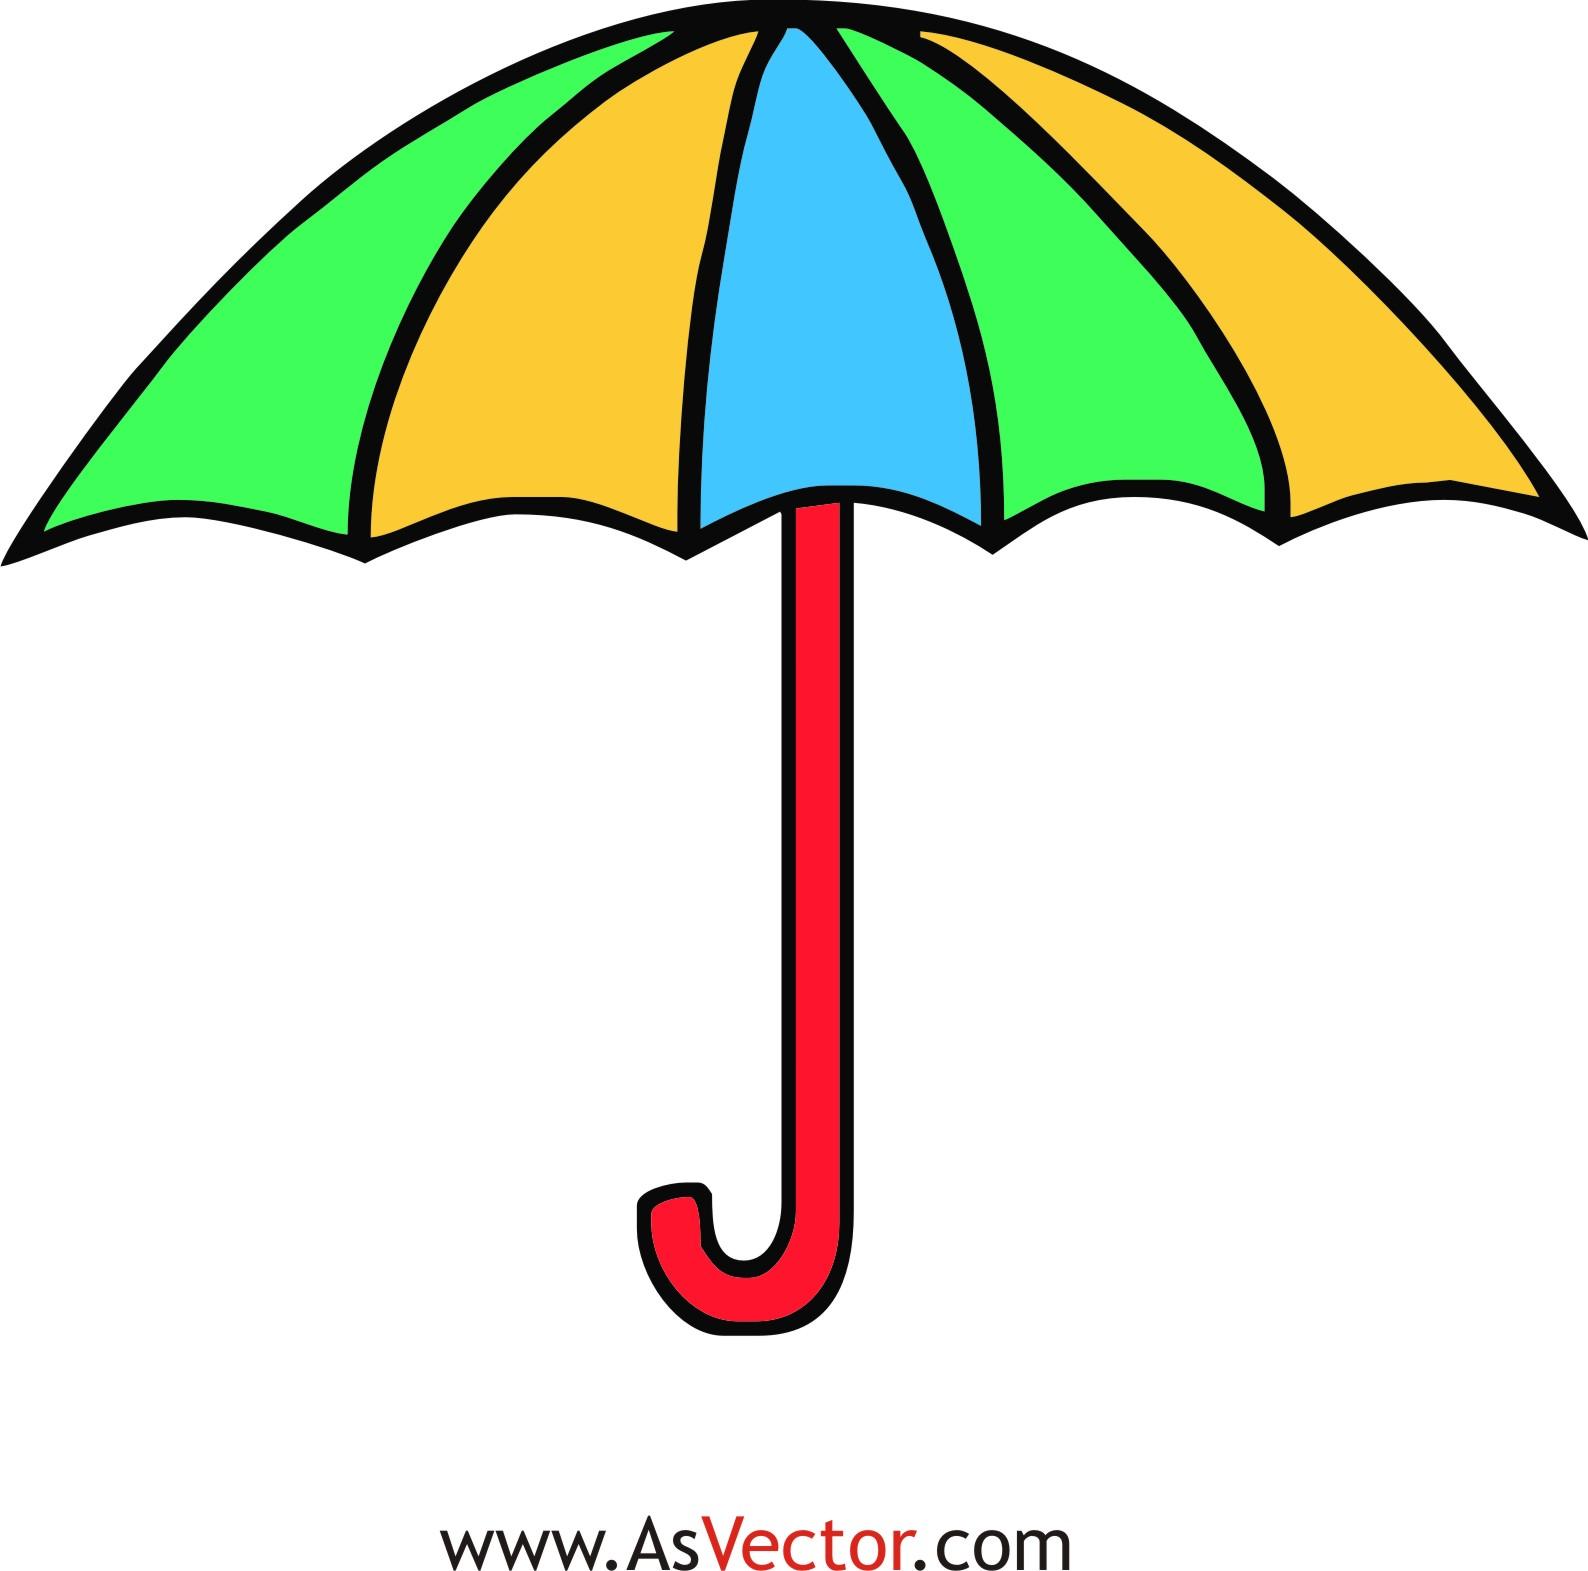 Umbrella clipart clipart . - Umbrella Clip Art Free